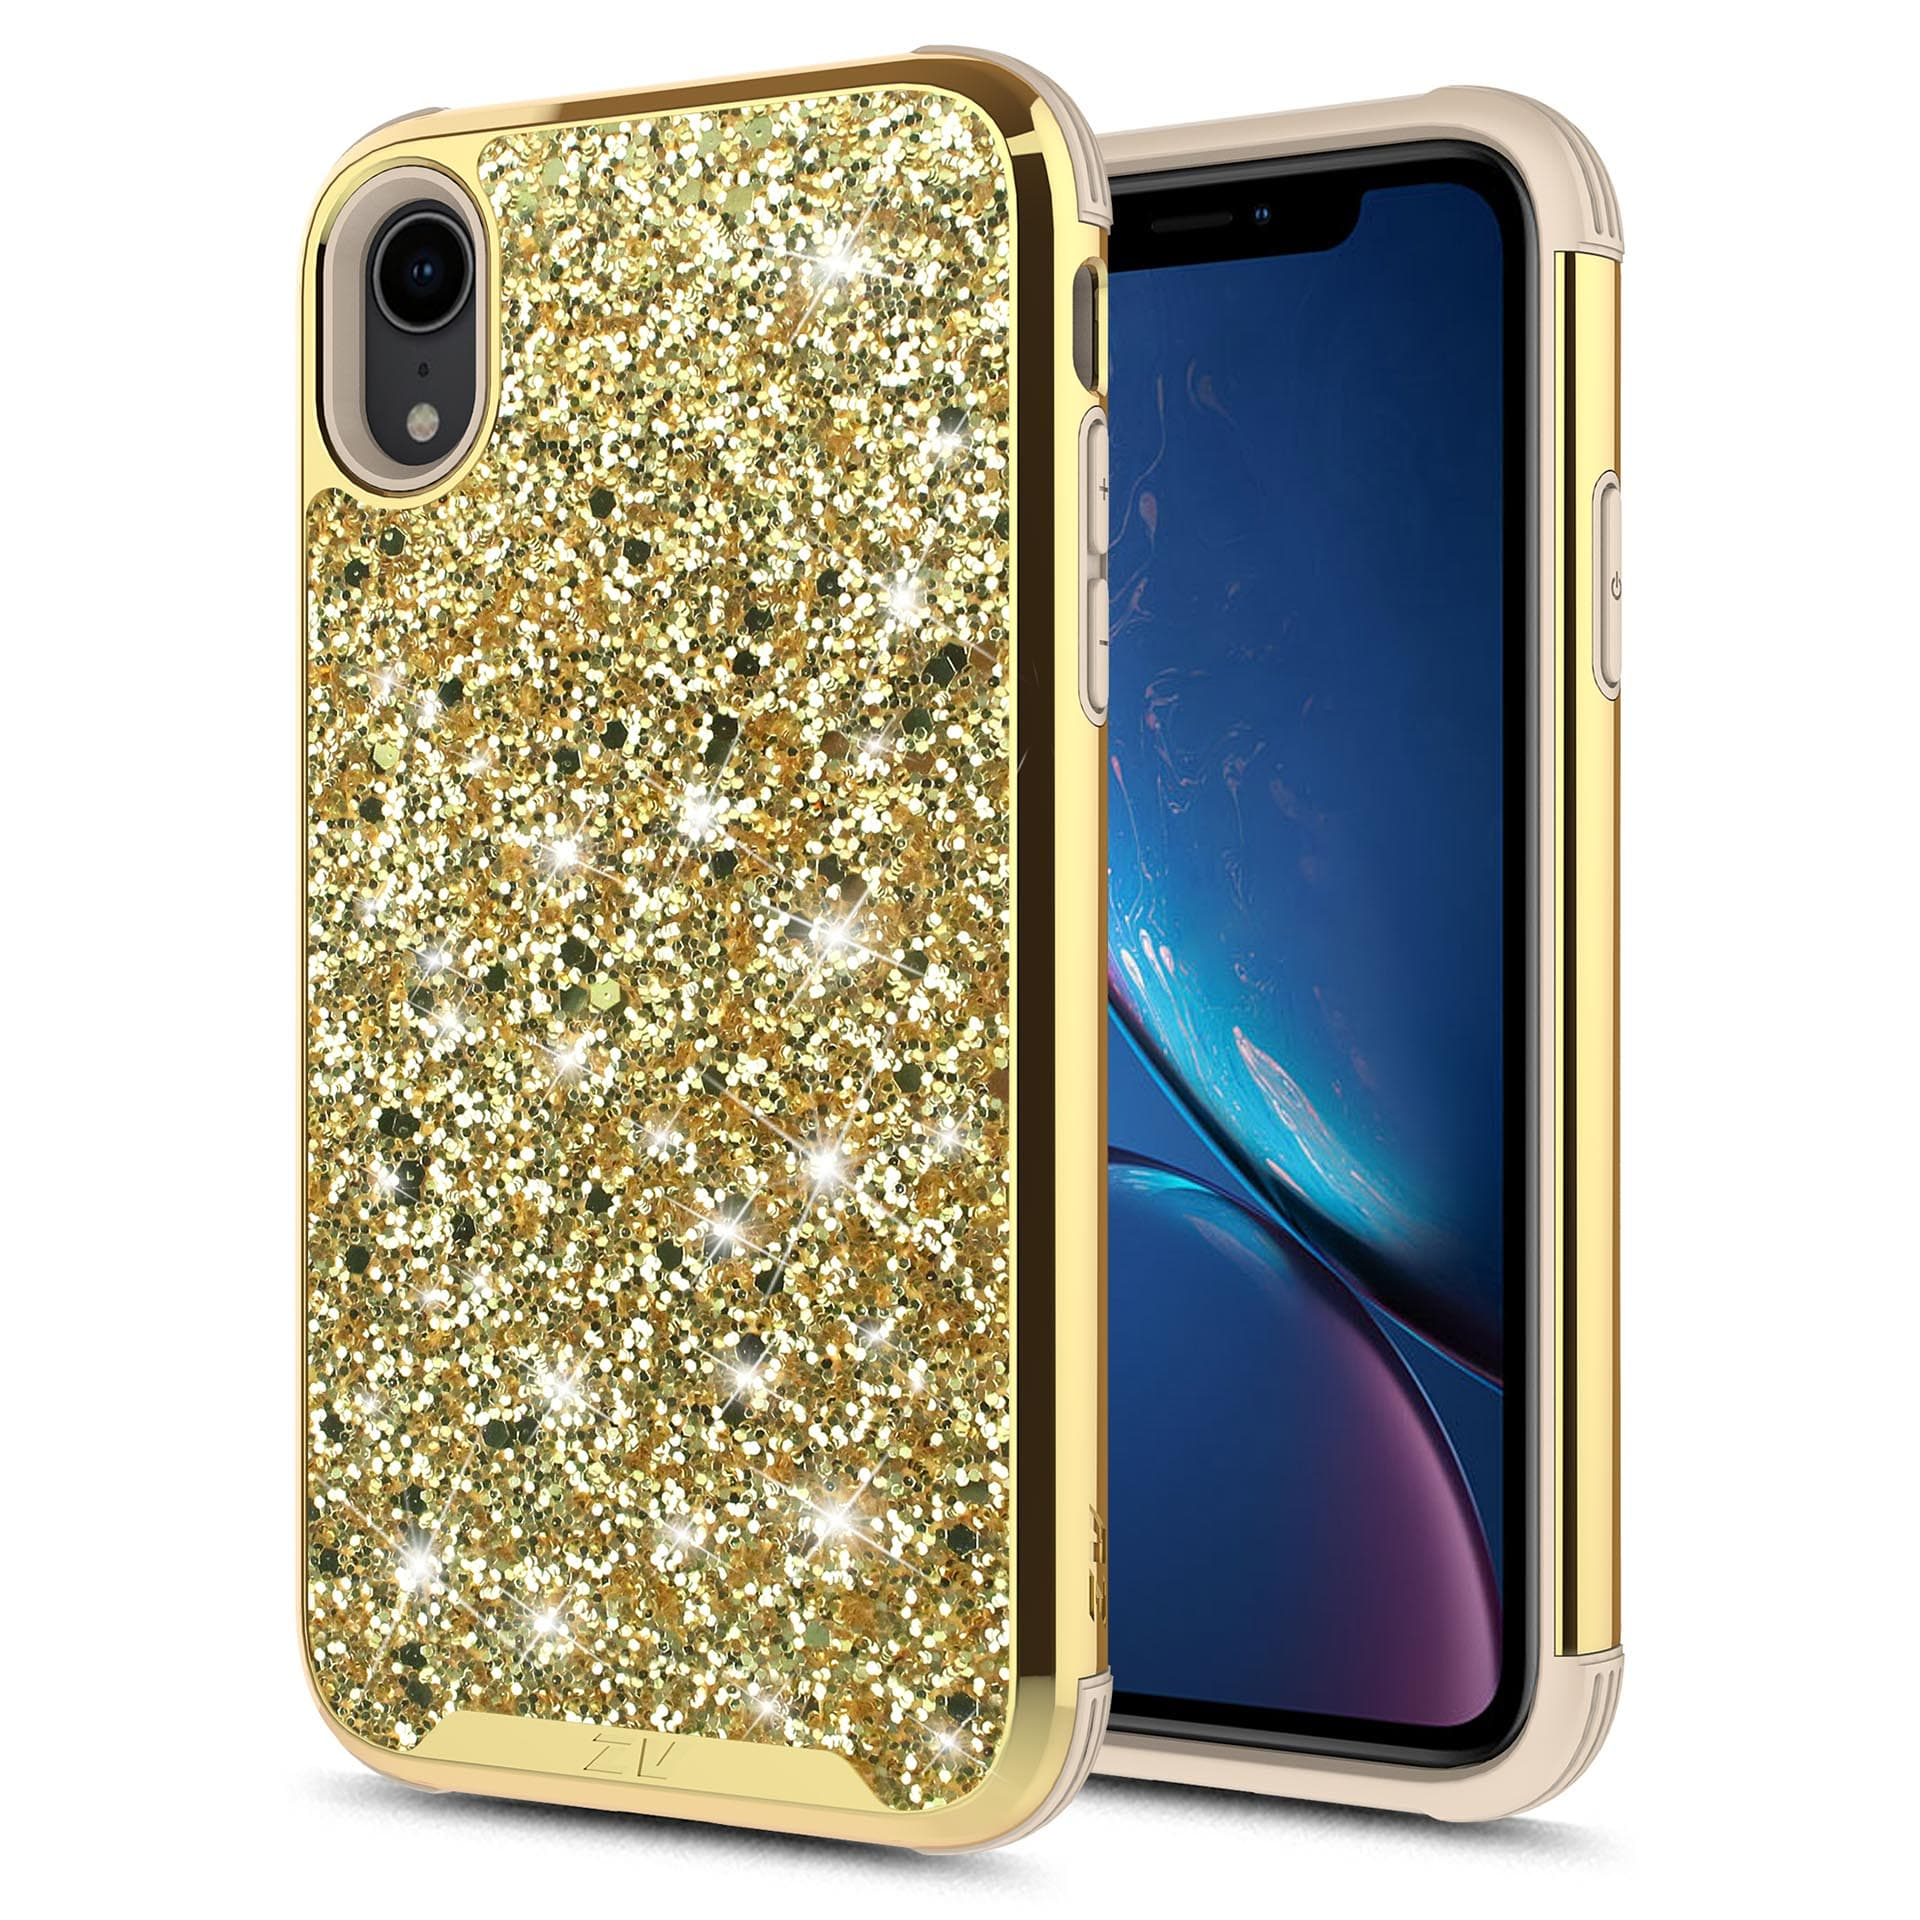 iPhone XR Case Full Diamond Hybrid Series - Zizo